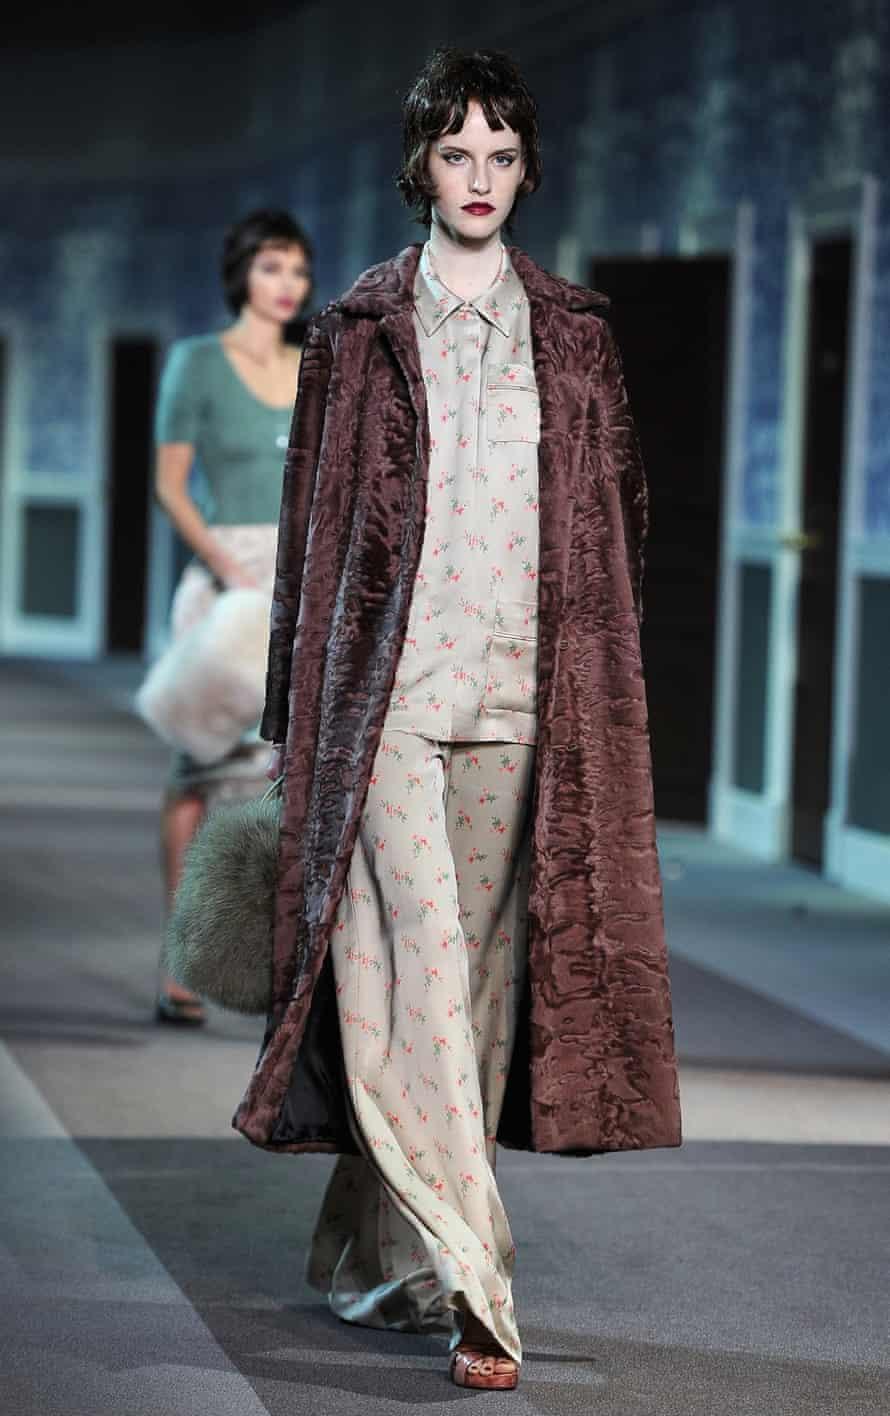 Louis Vuitton model